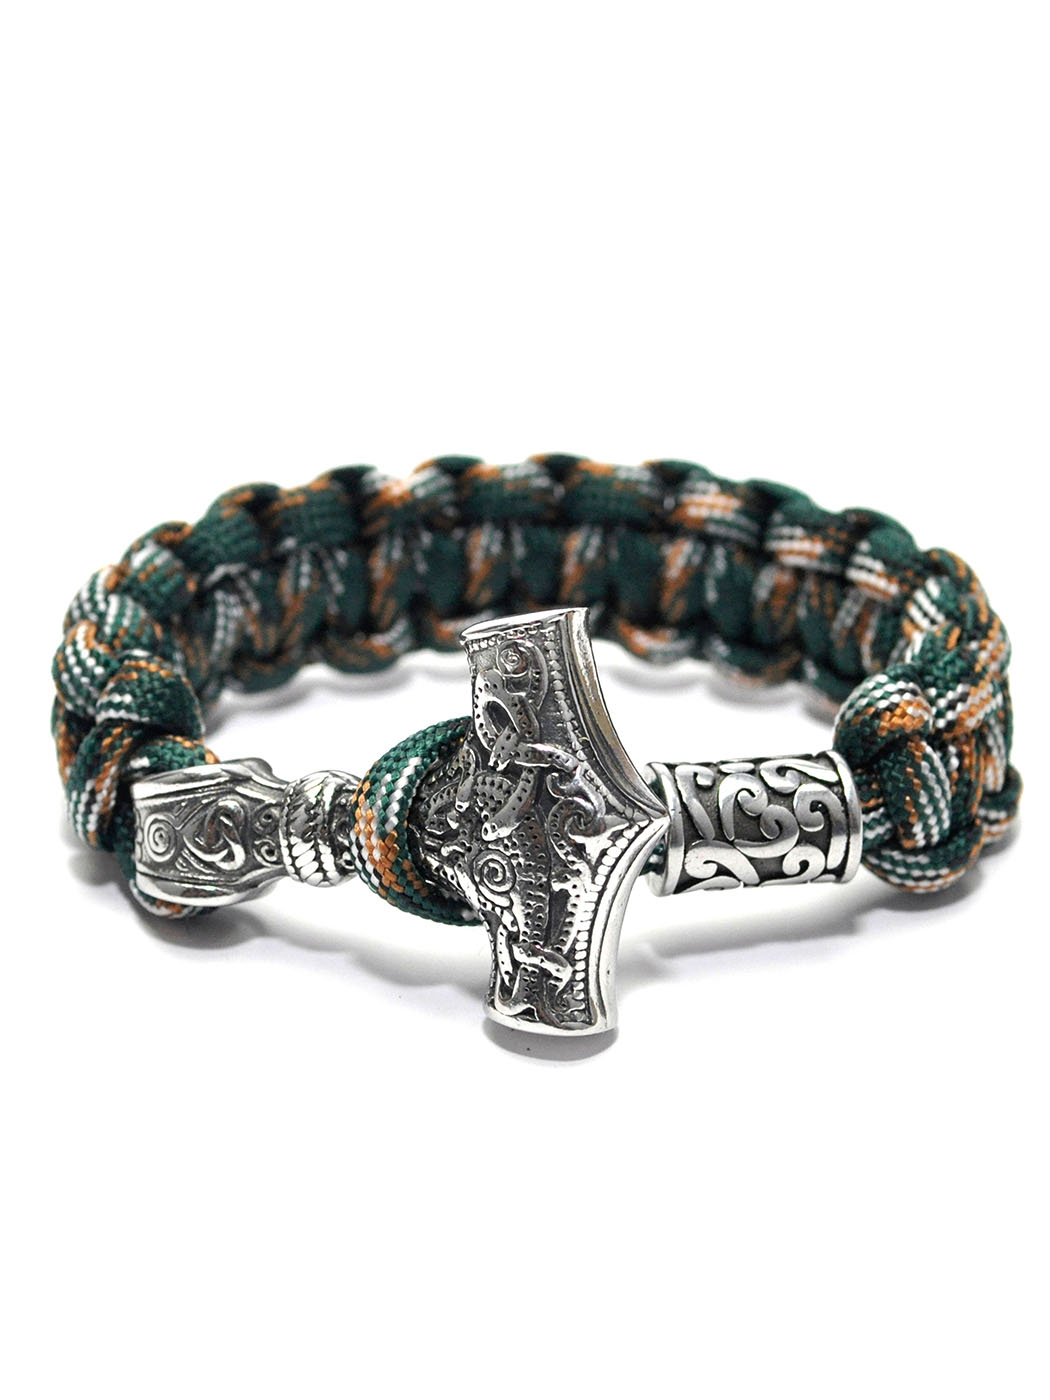 Thor Bracelet Green, Wolf Wristband Los Angeles, Fenrir Armband Los Angeles